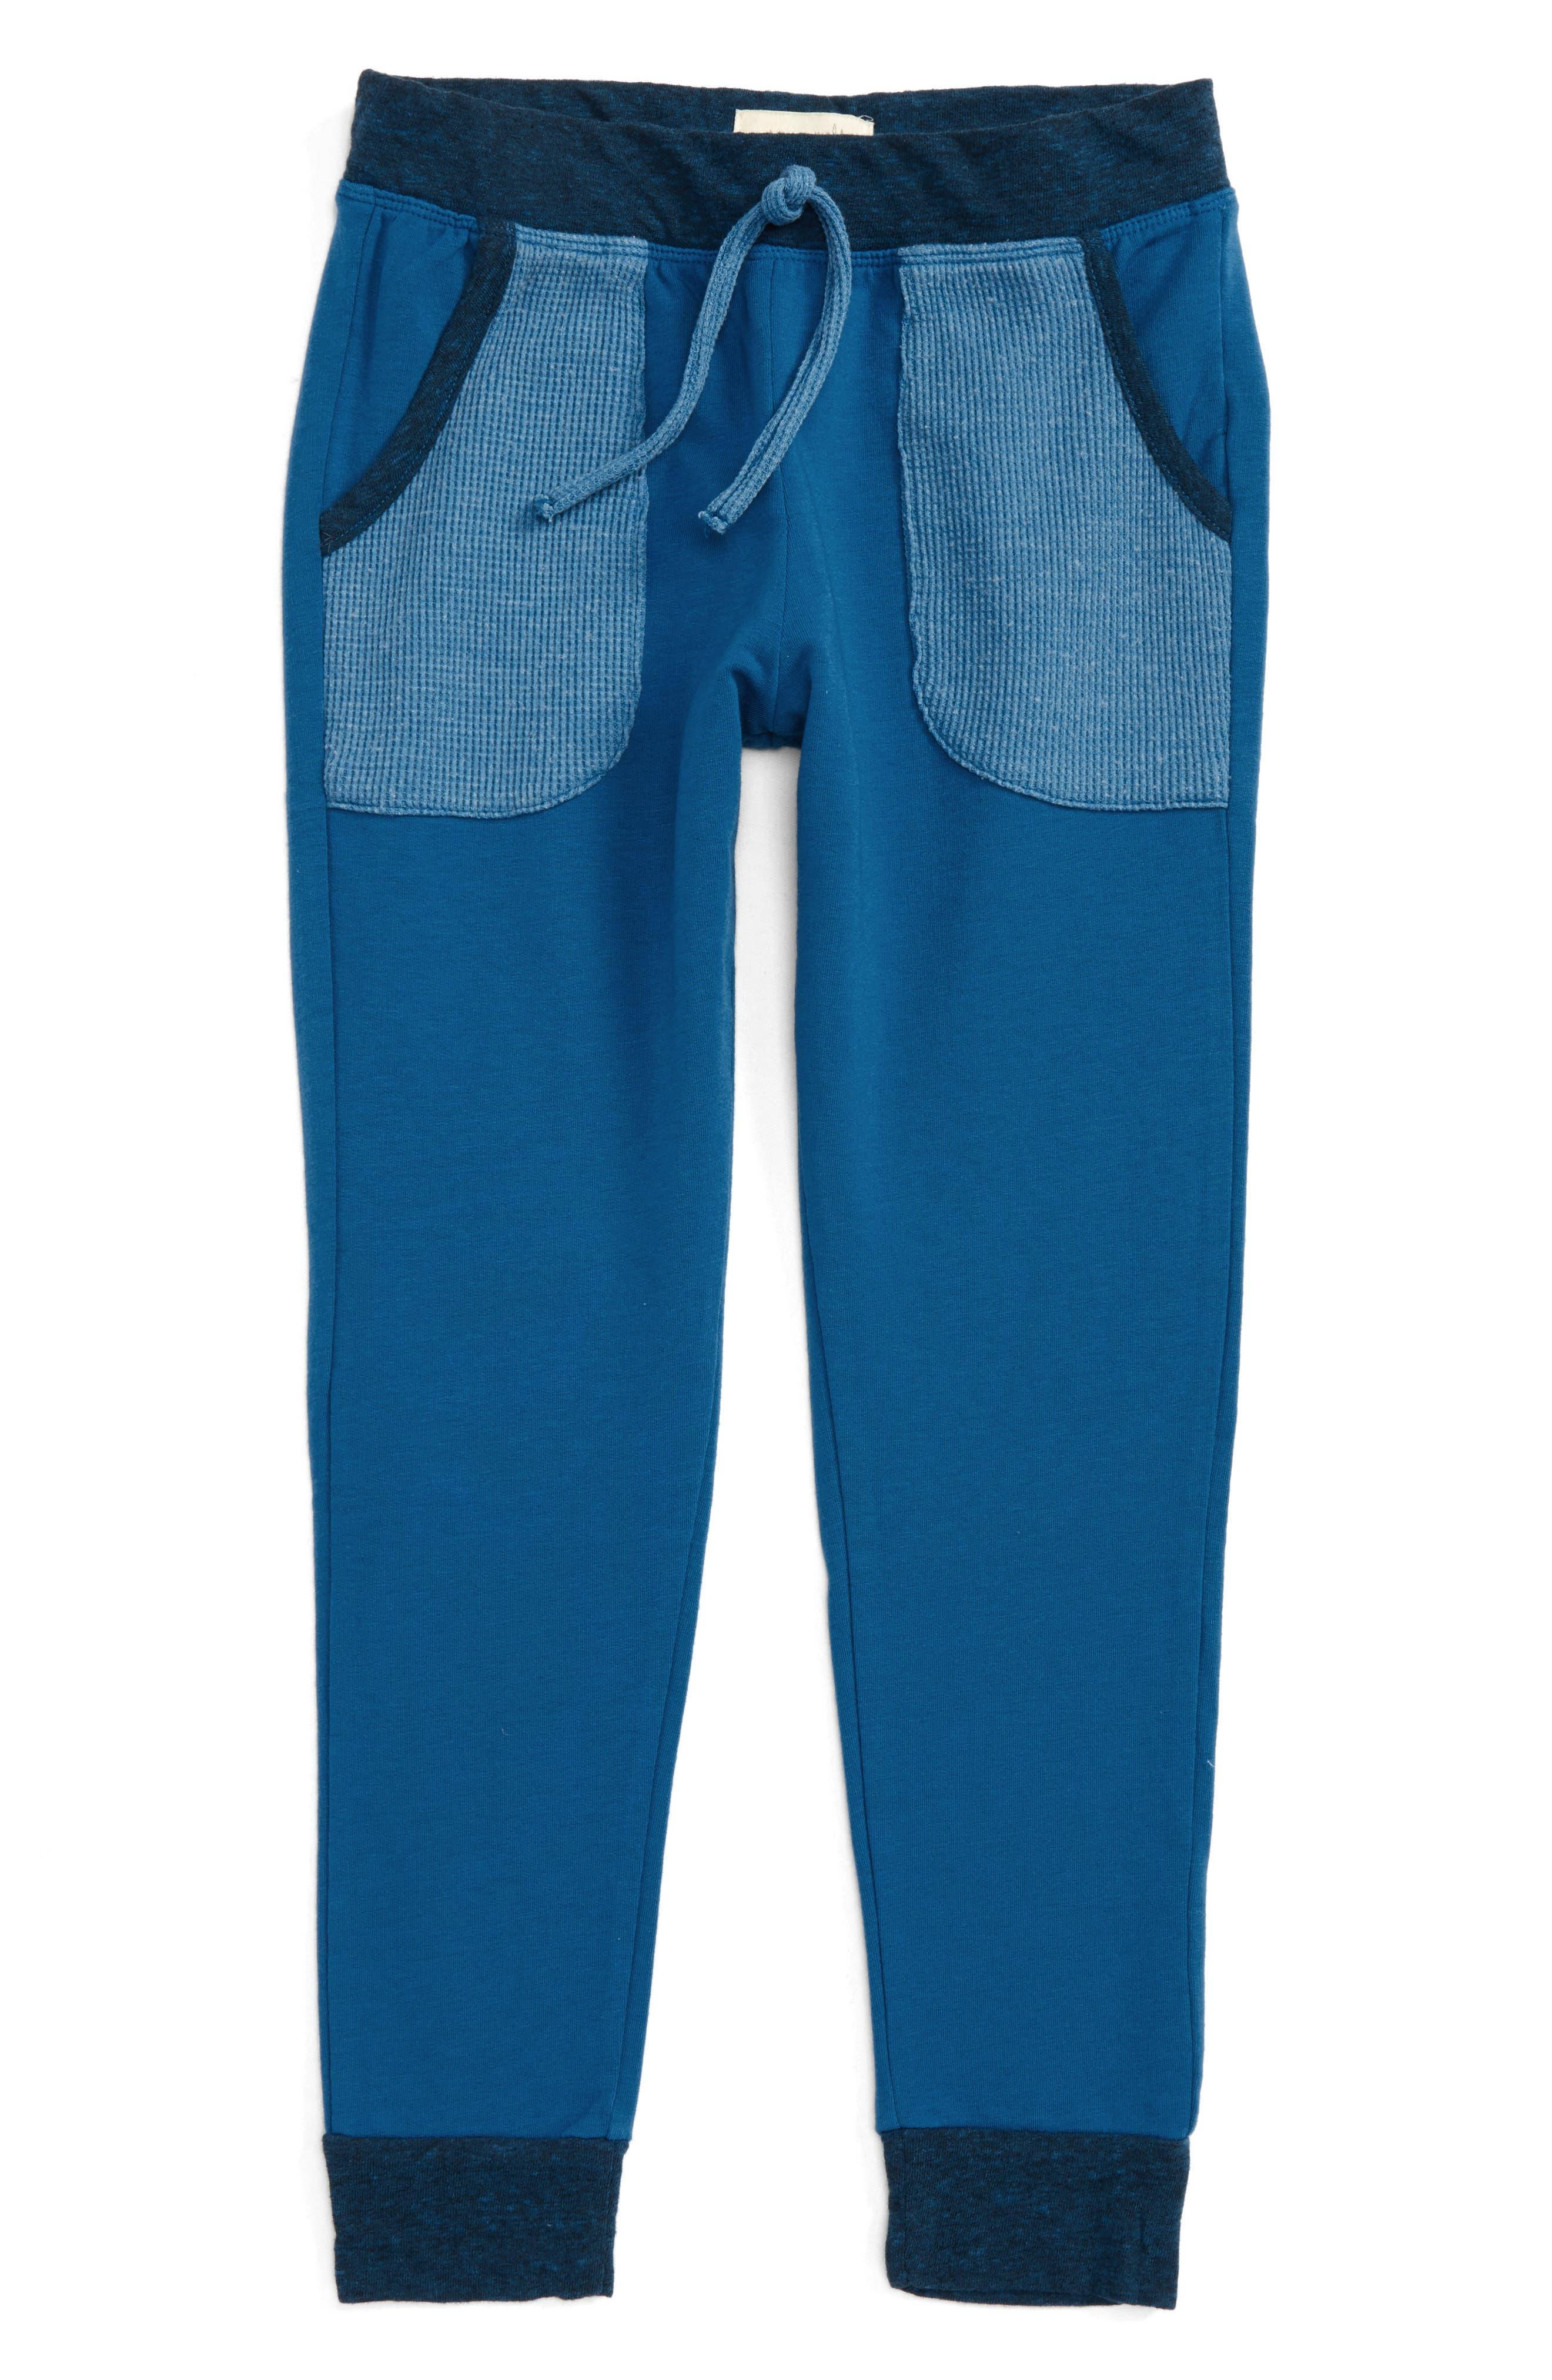 Alternate Image 1 Selected - Miki Miette Haydon Jogger Pants (Toddler Boys, Little Boys & Big Boys)